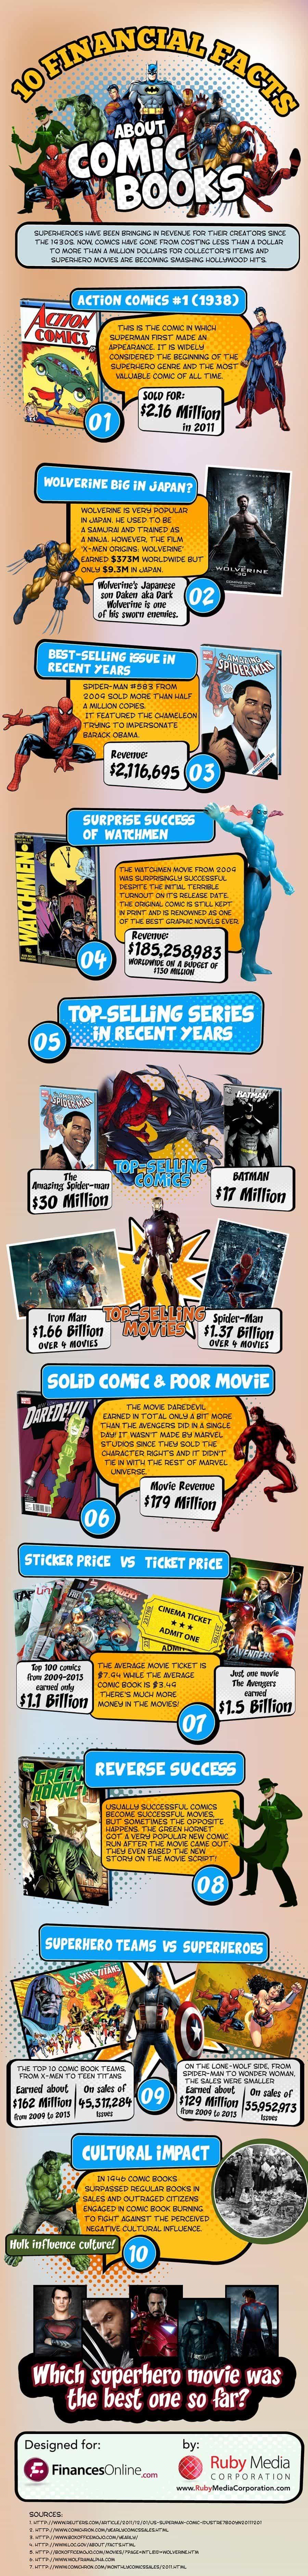 10-comic-books